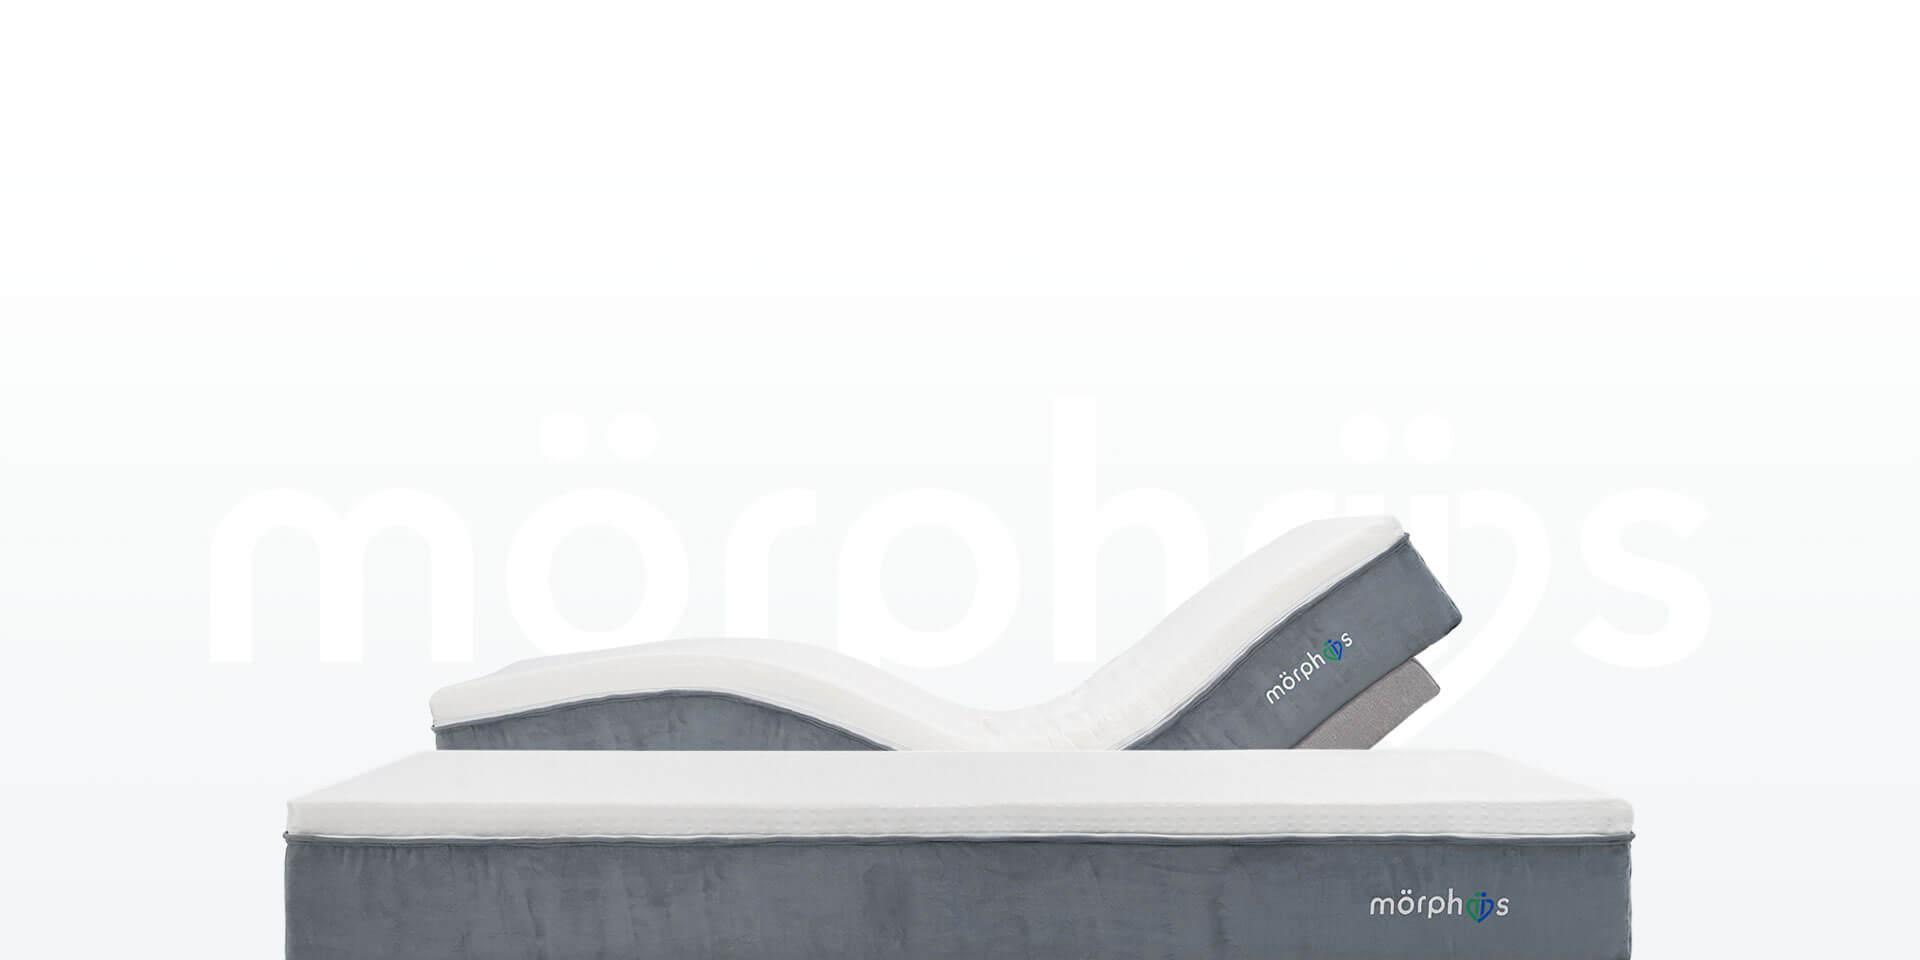 Morphiis mattress